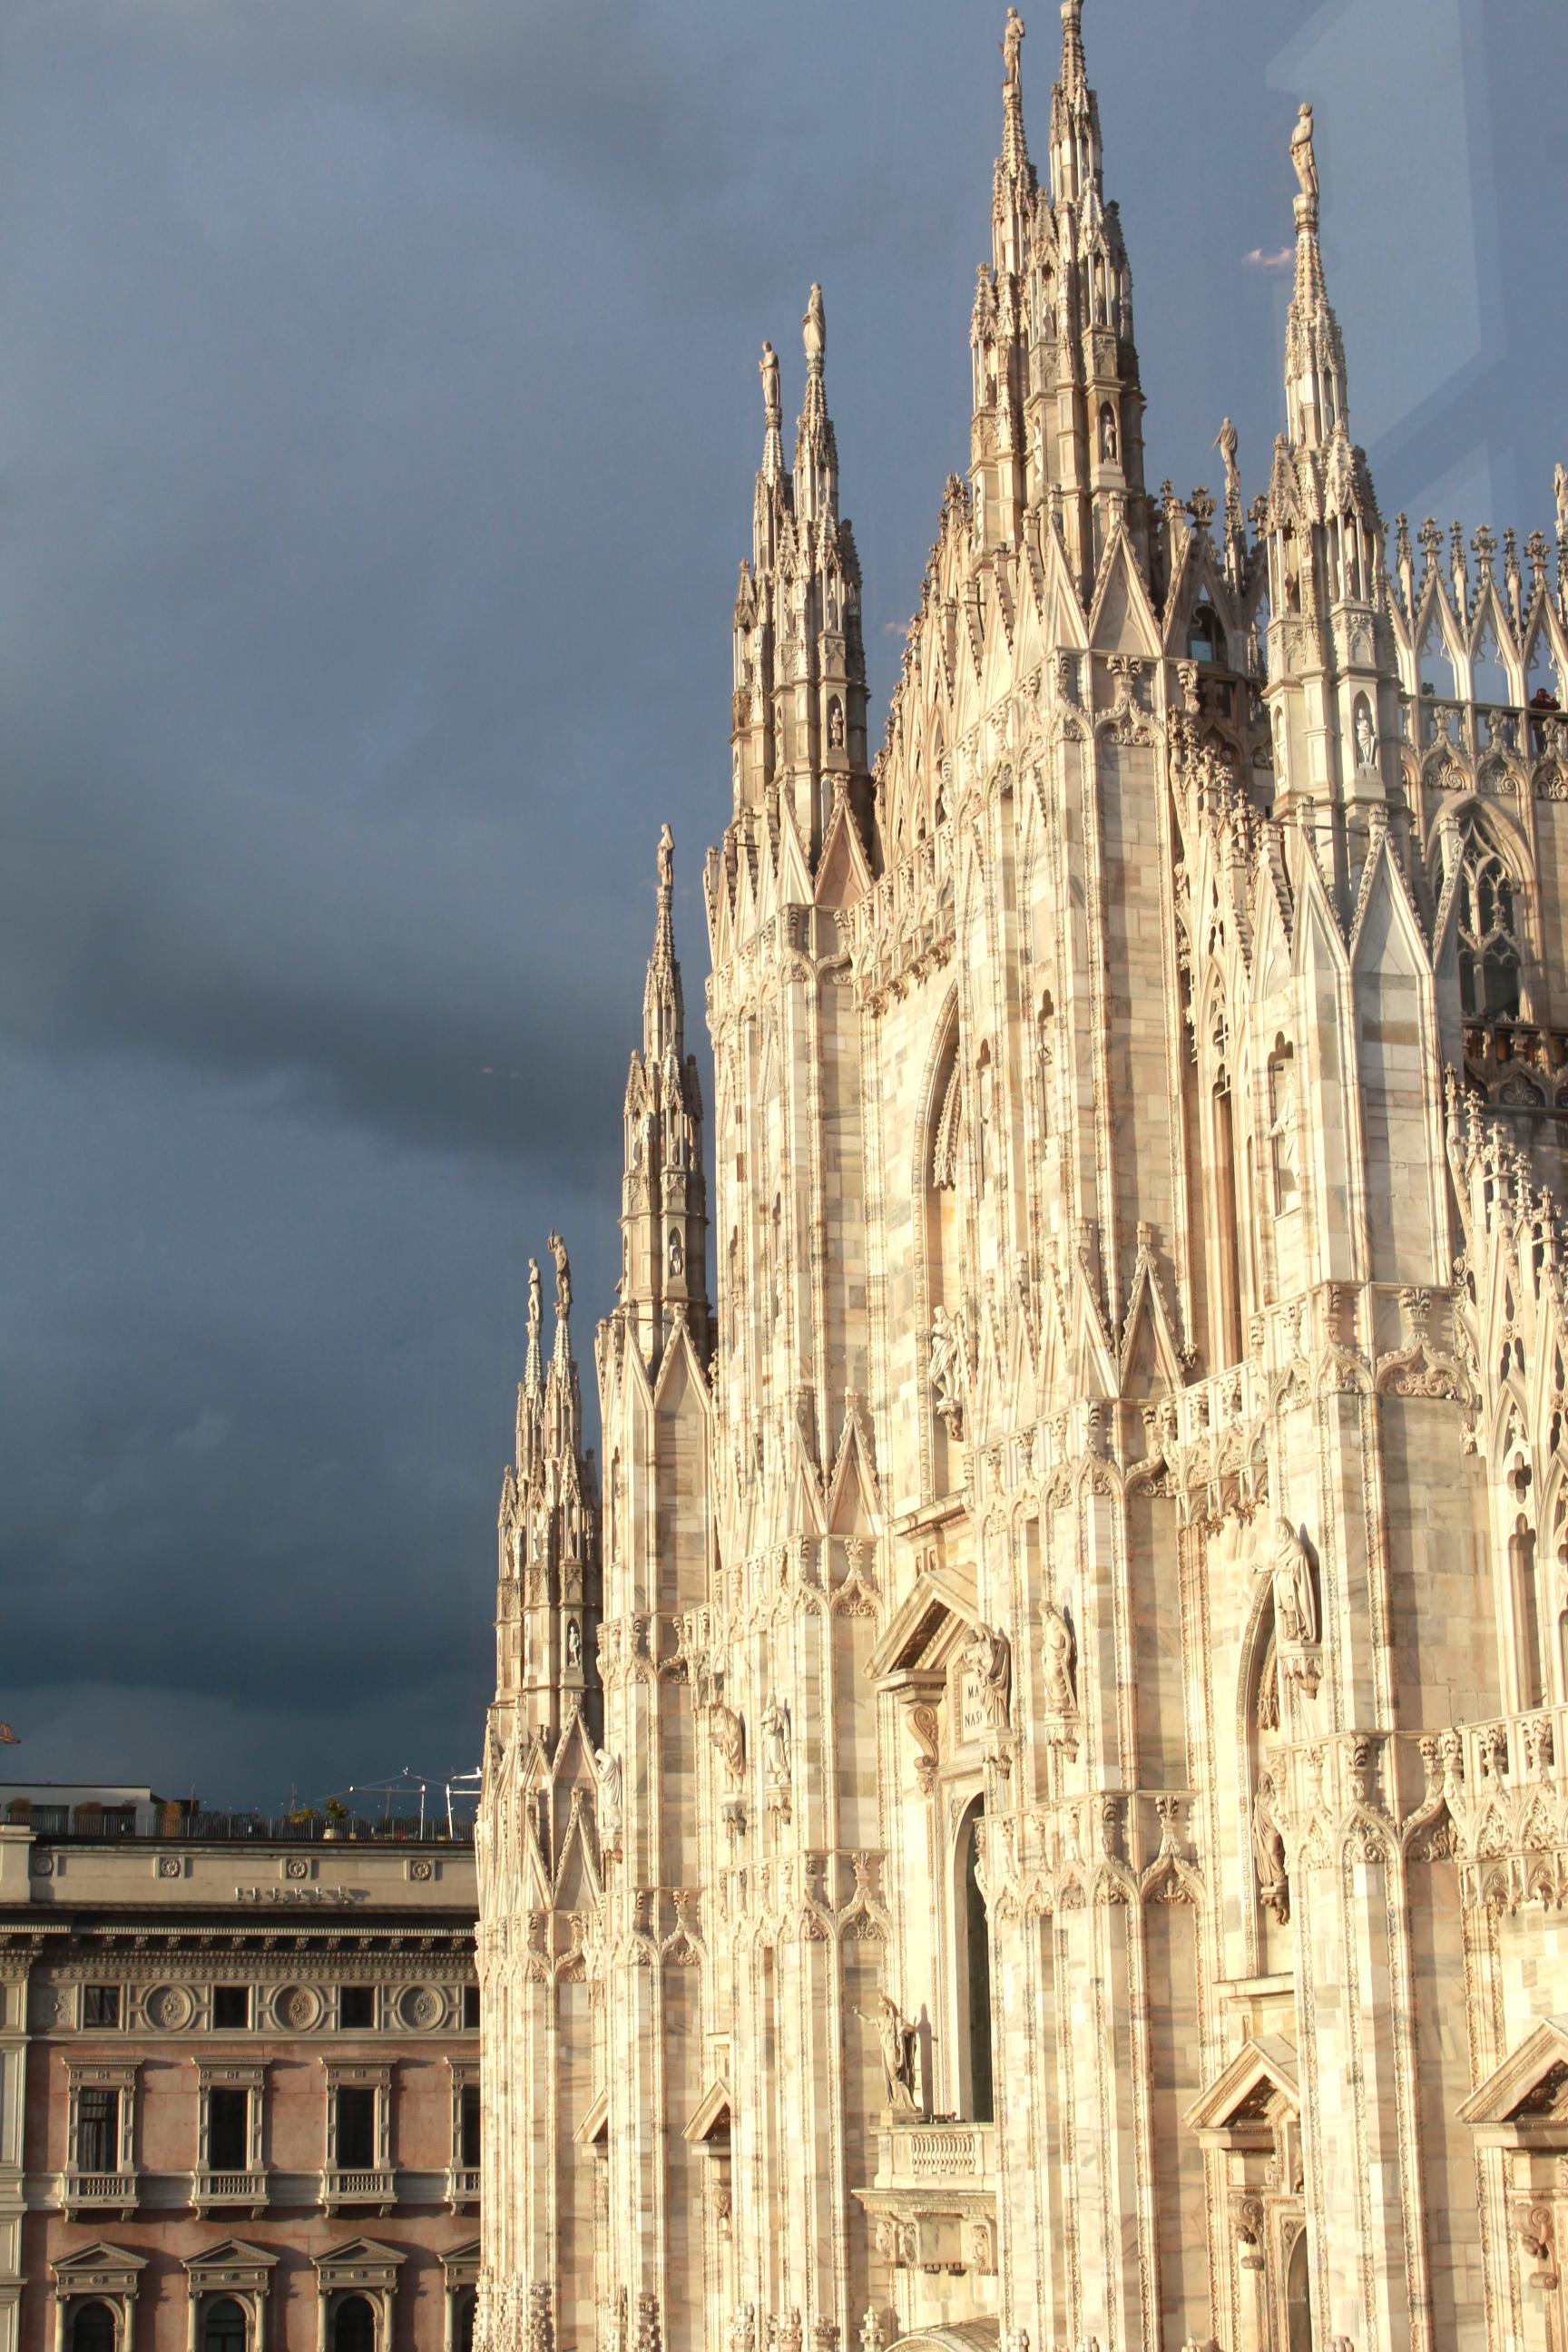 Duomo di Milano; Italy